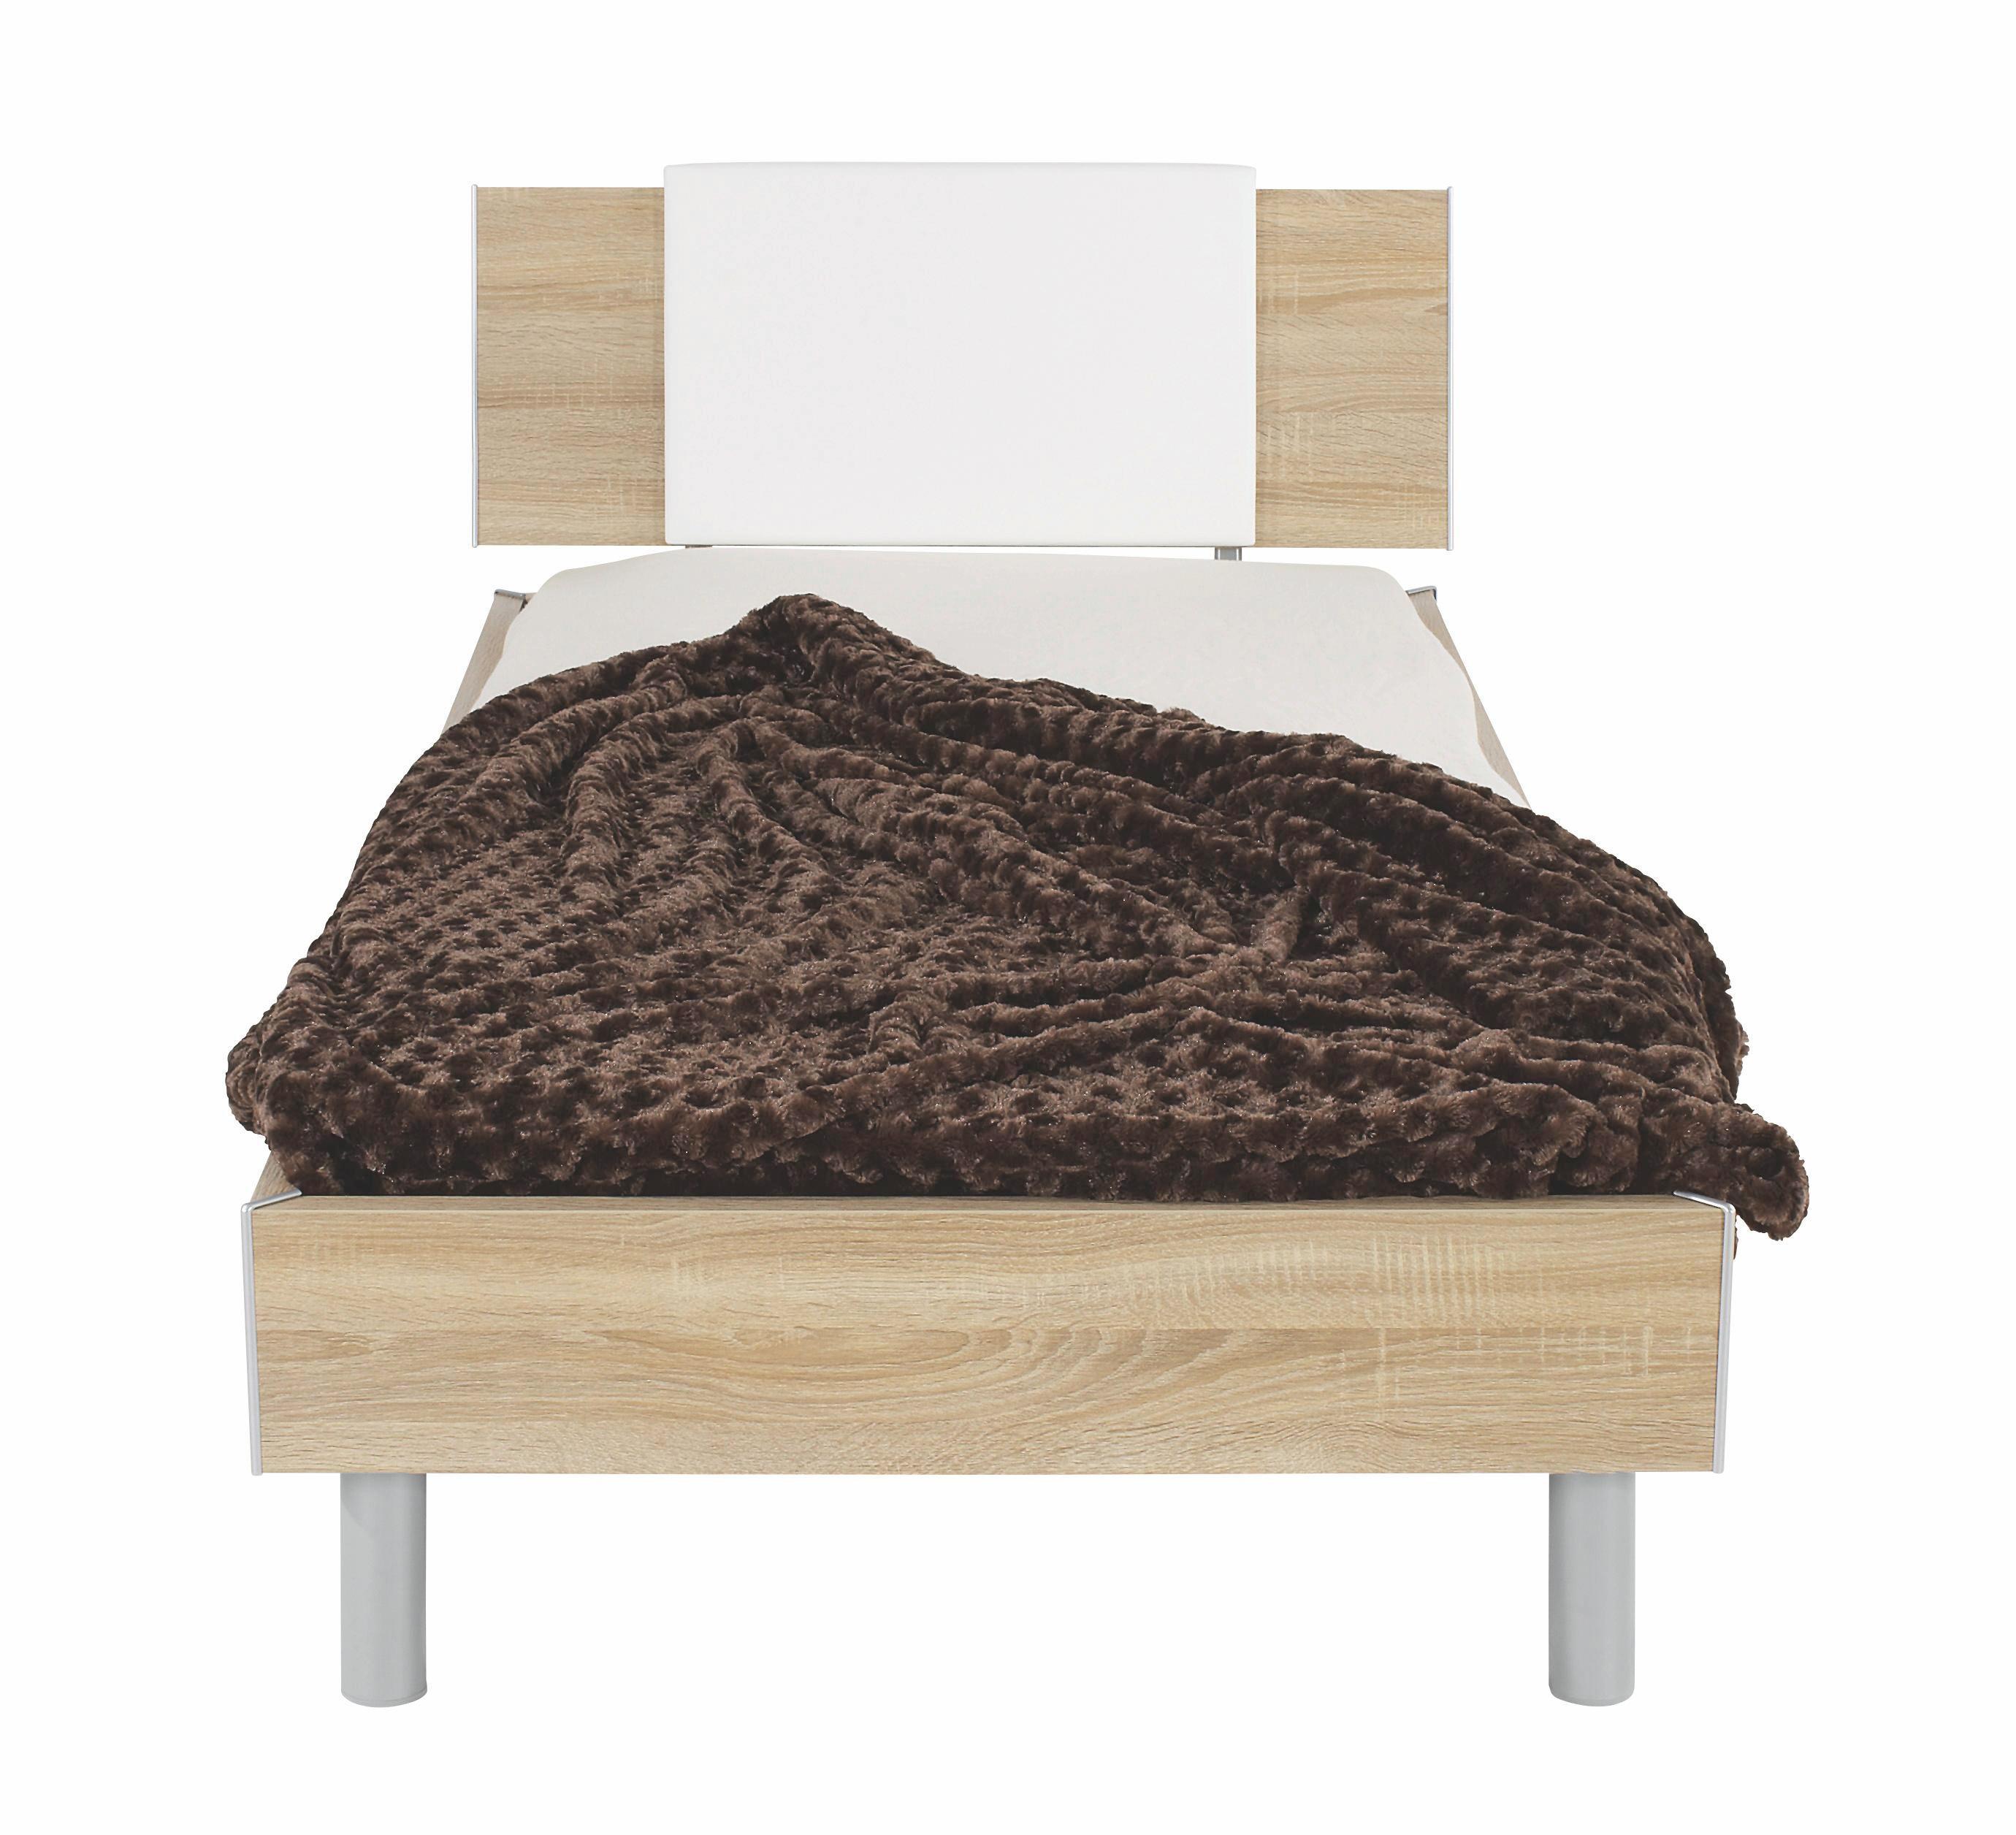 Futon Krevet Okvir Kreveta - Konvencionalno, drvo (90/200cm)